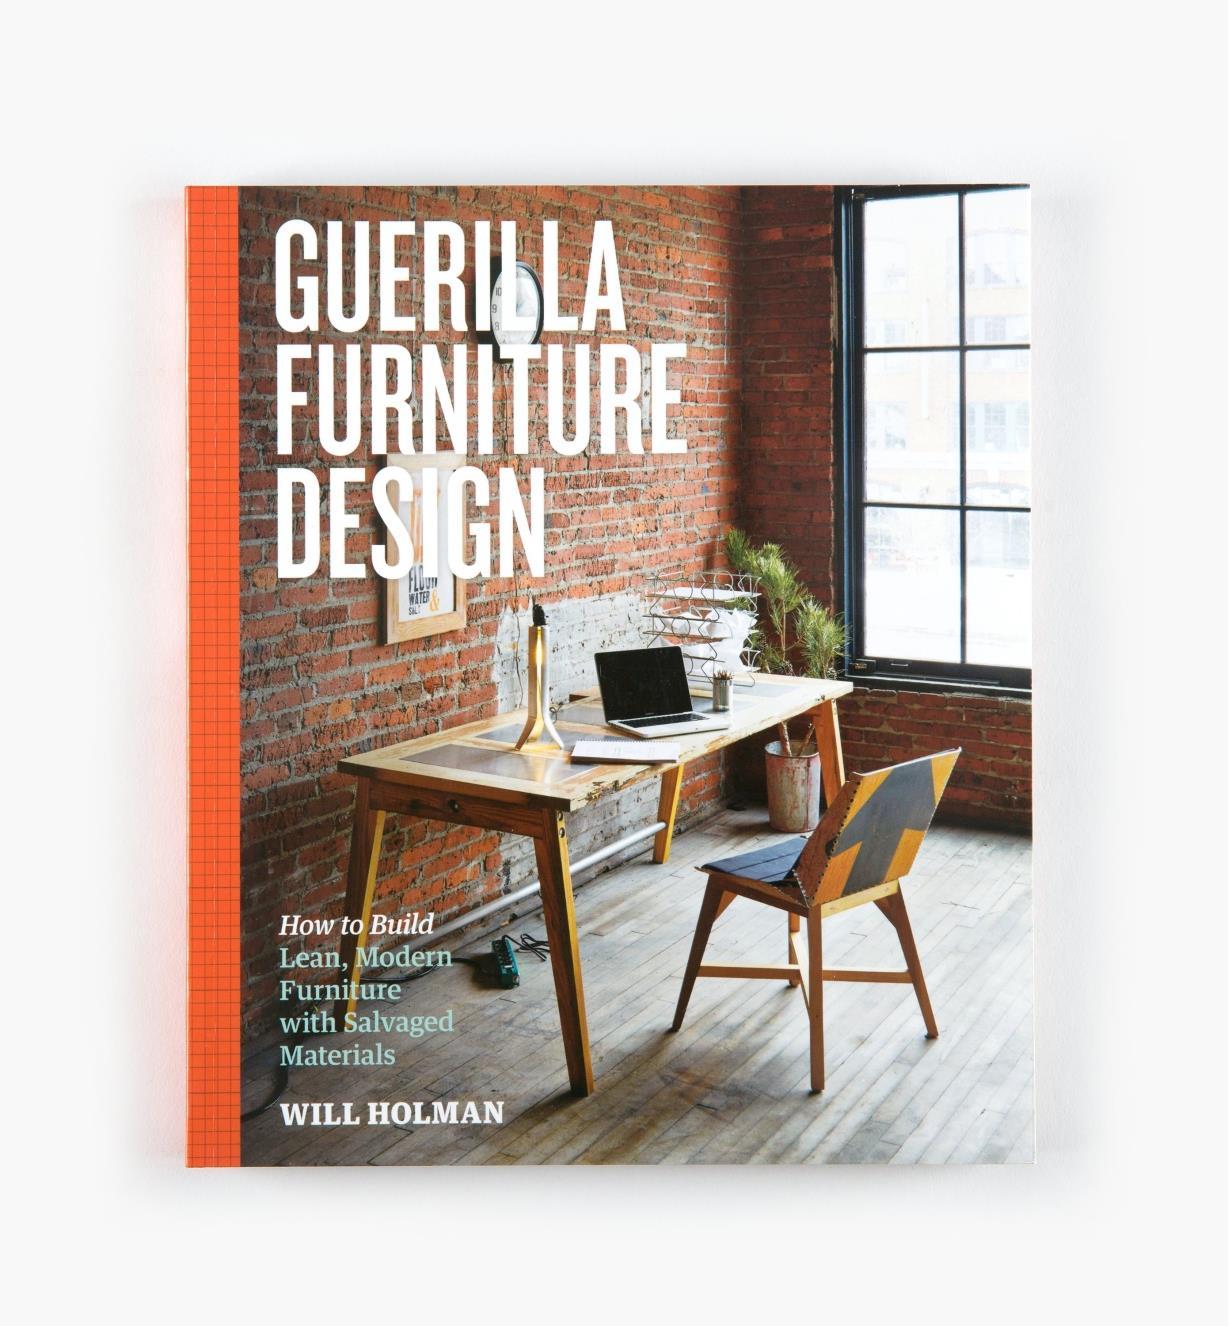 49L0912 - Guerilla Furniture Design